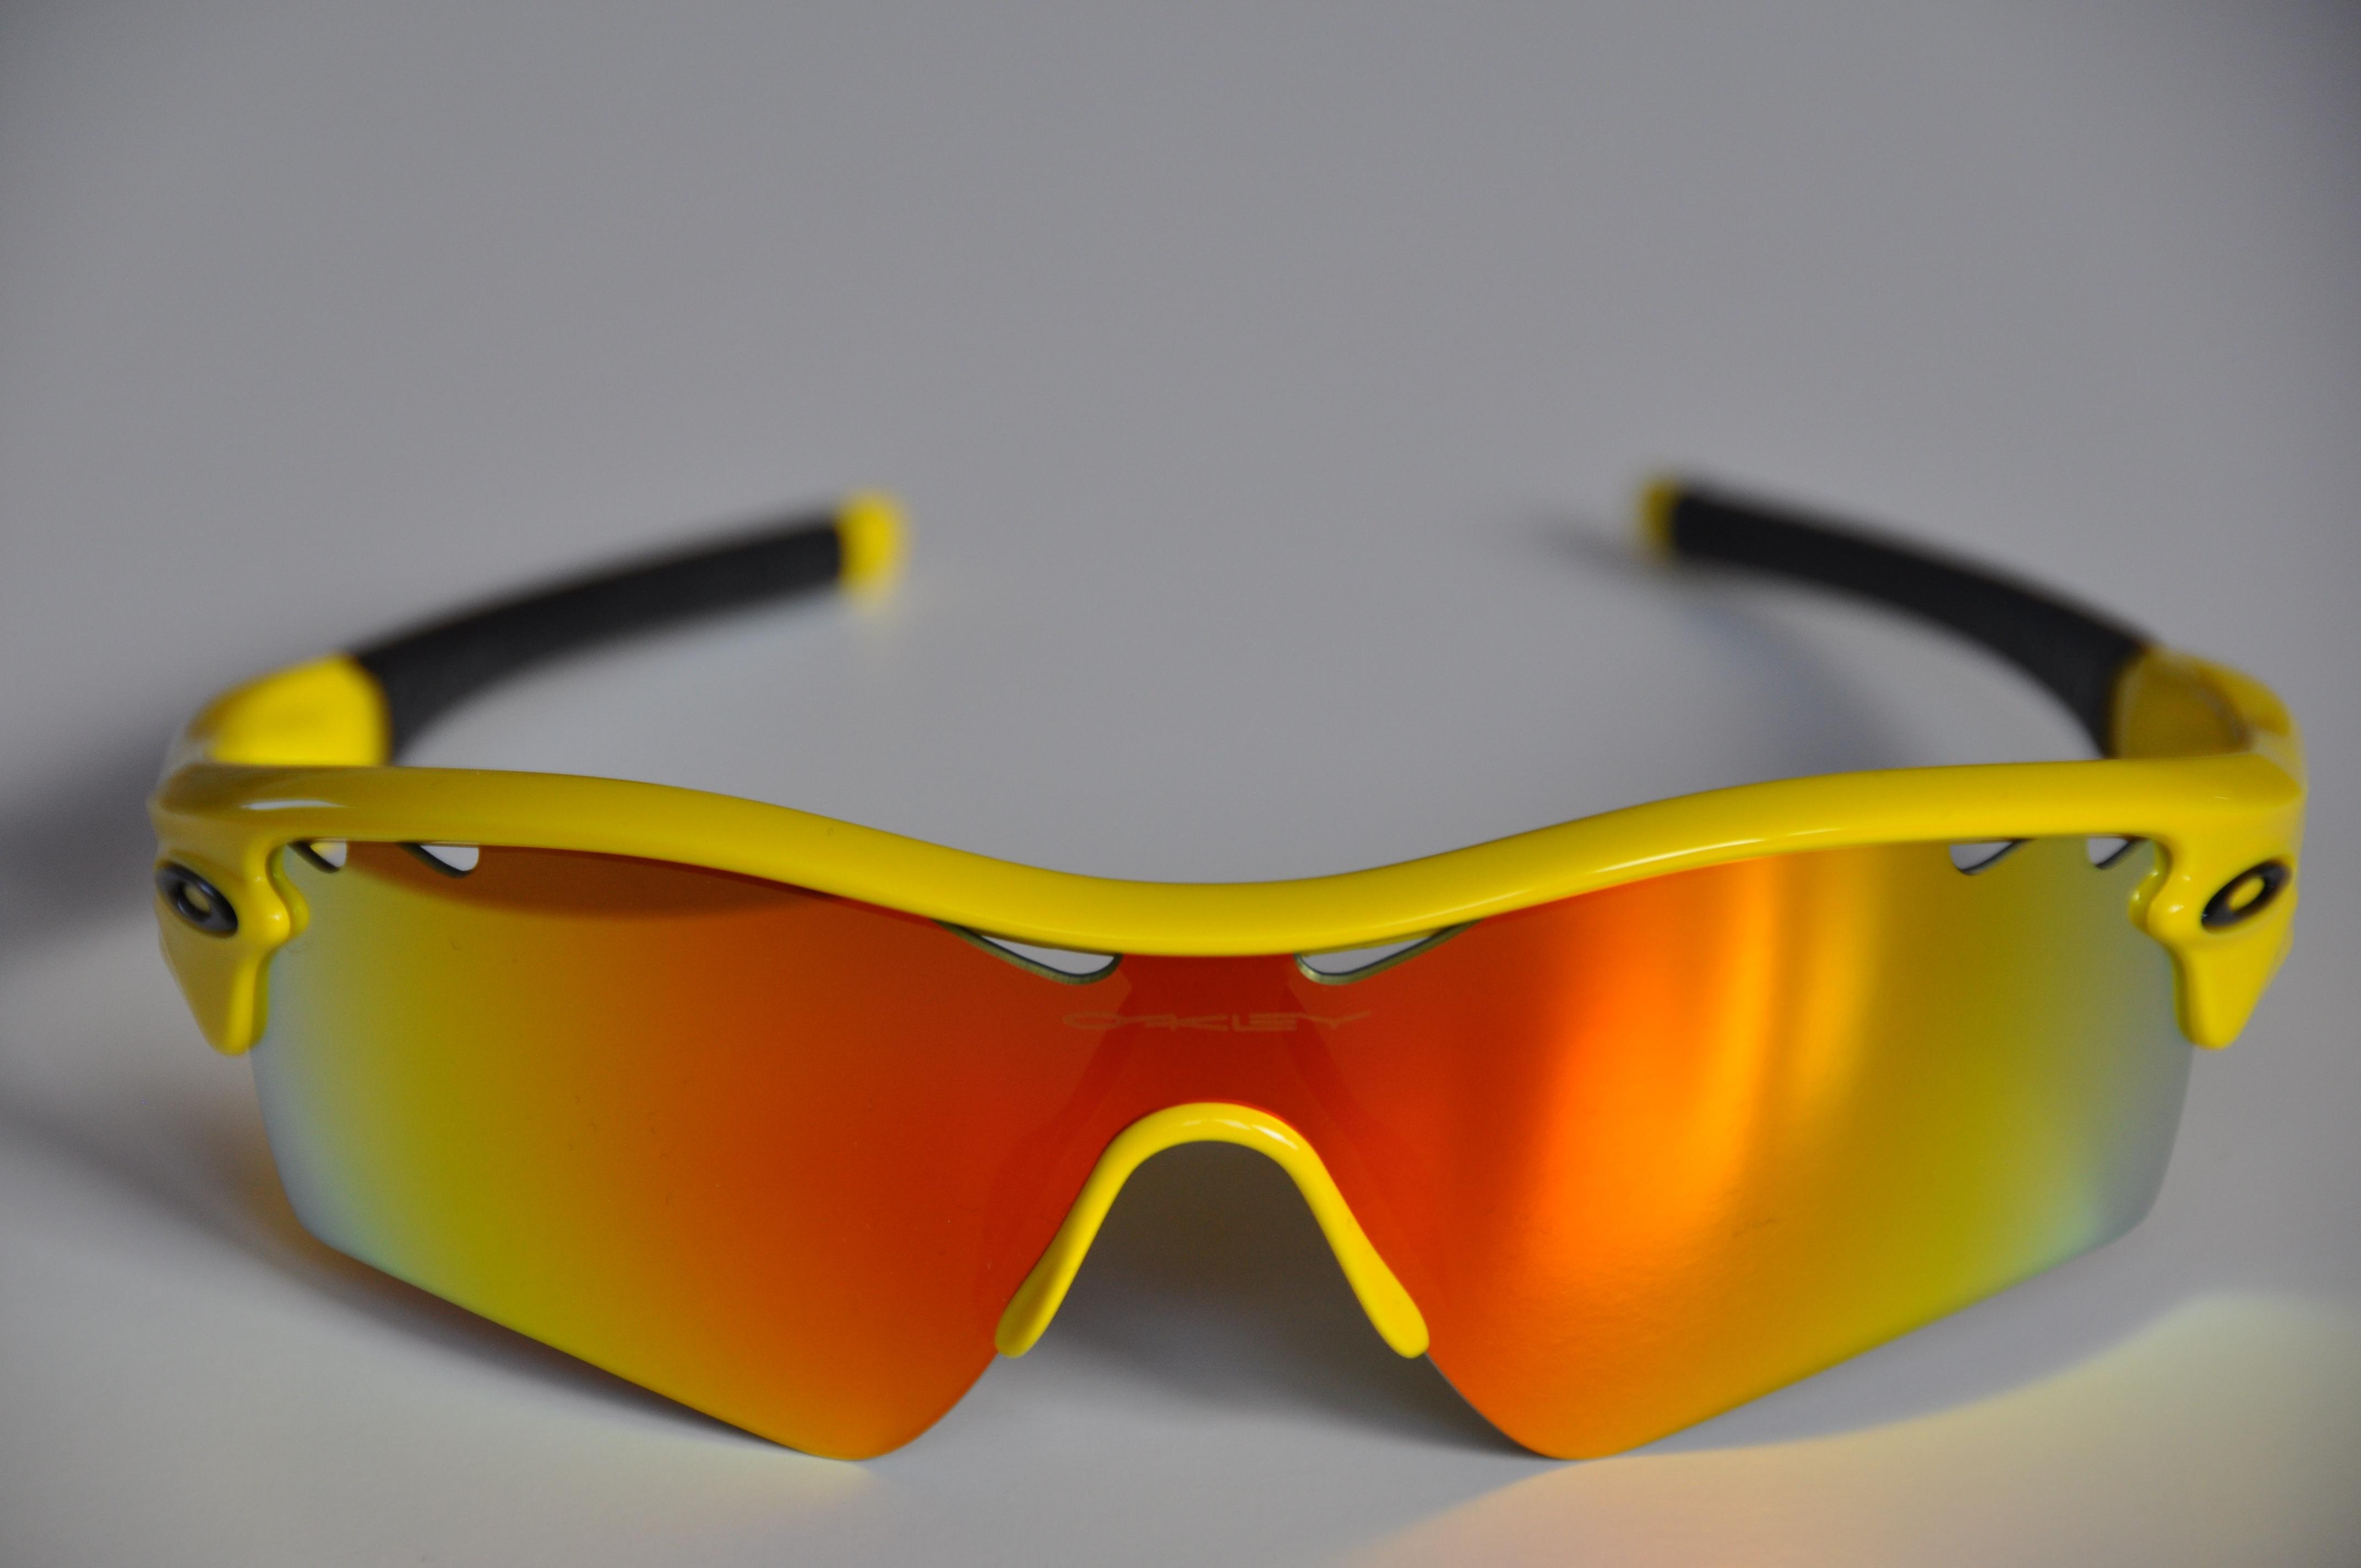 Free Images Yellow Tour De France Sunglasses Glasses Goggles